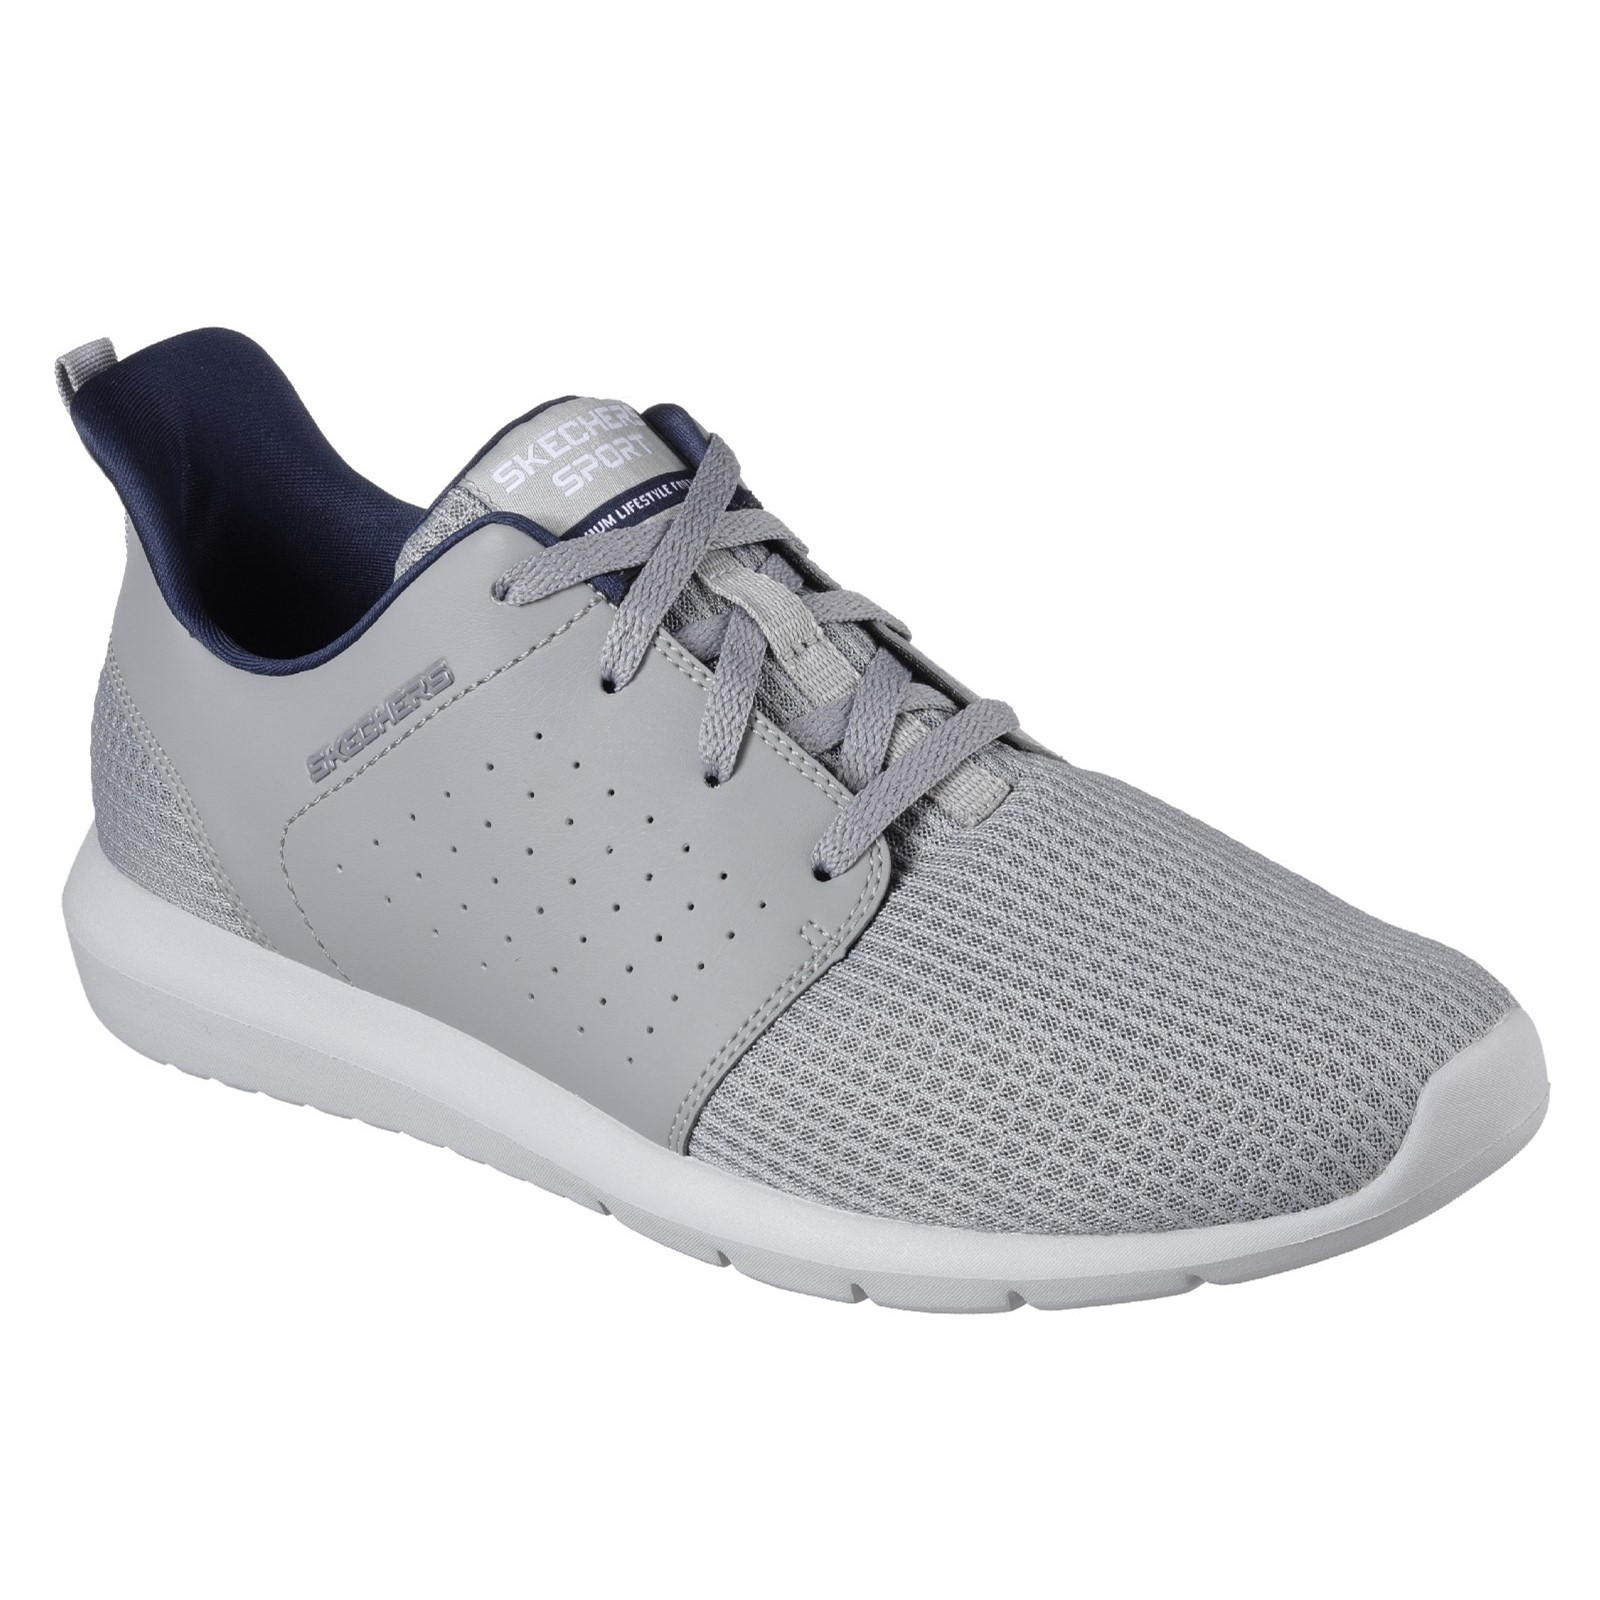 free shipping da84c 1b8b5 ... NIKELAB ROSHE TWO PREMIUM Men s Sneakers Running Running Running Shoes  42f84d ...